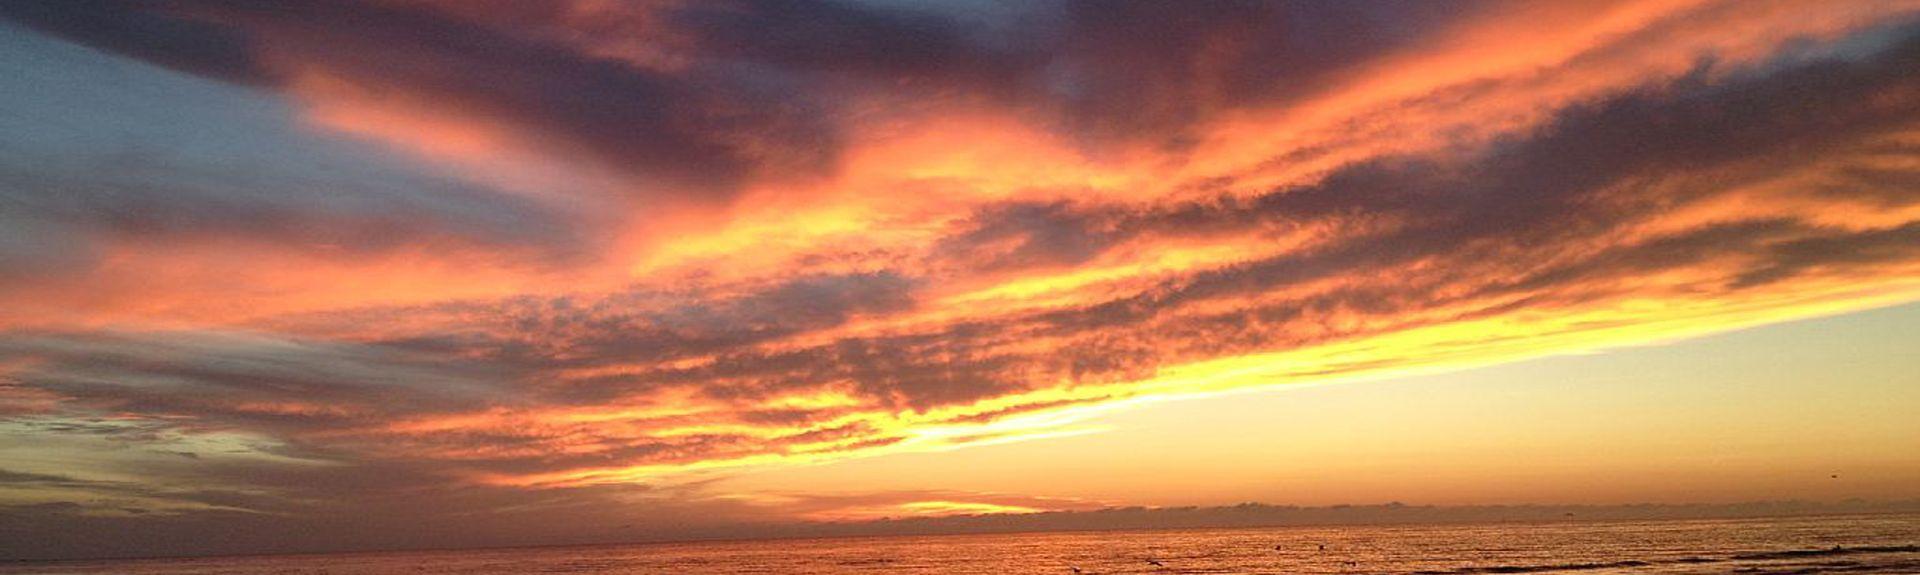 Siesta Dunes, Siesta Key, Florida, United States of America